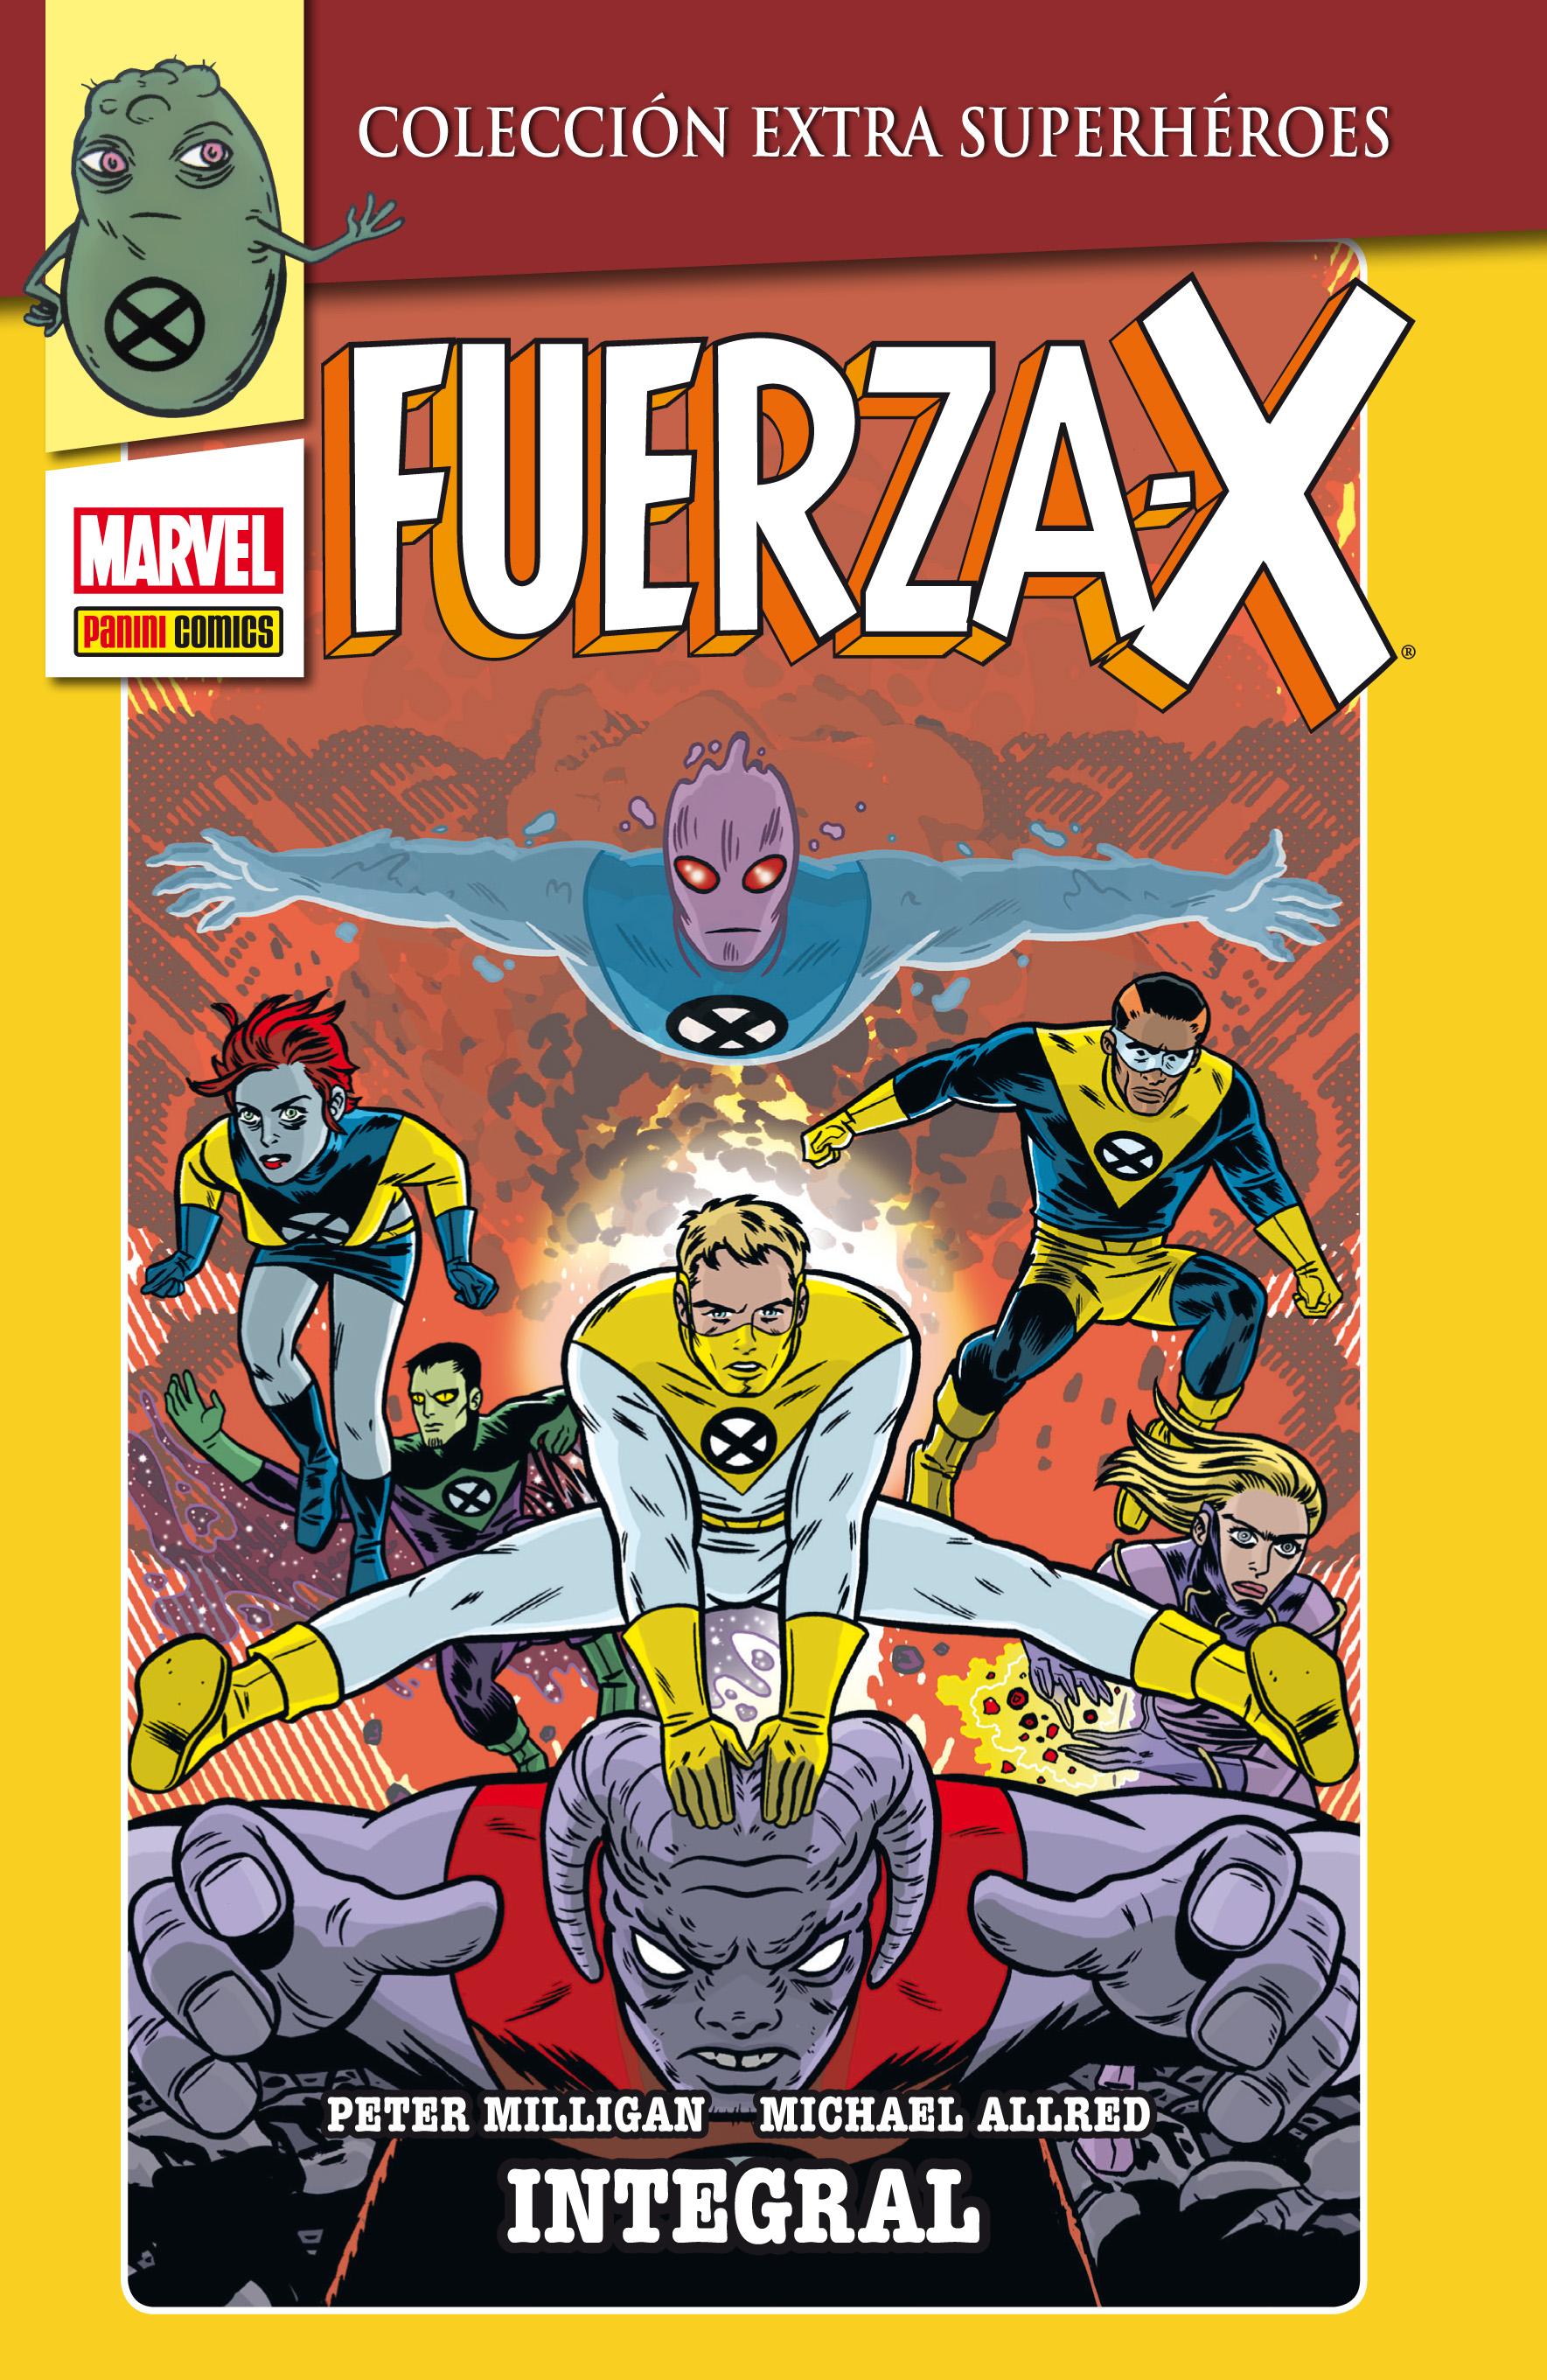 Fuerza X, de Peter Milligan y Mike Allred.